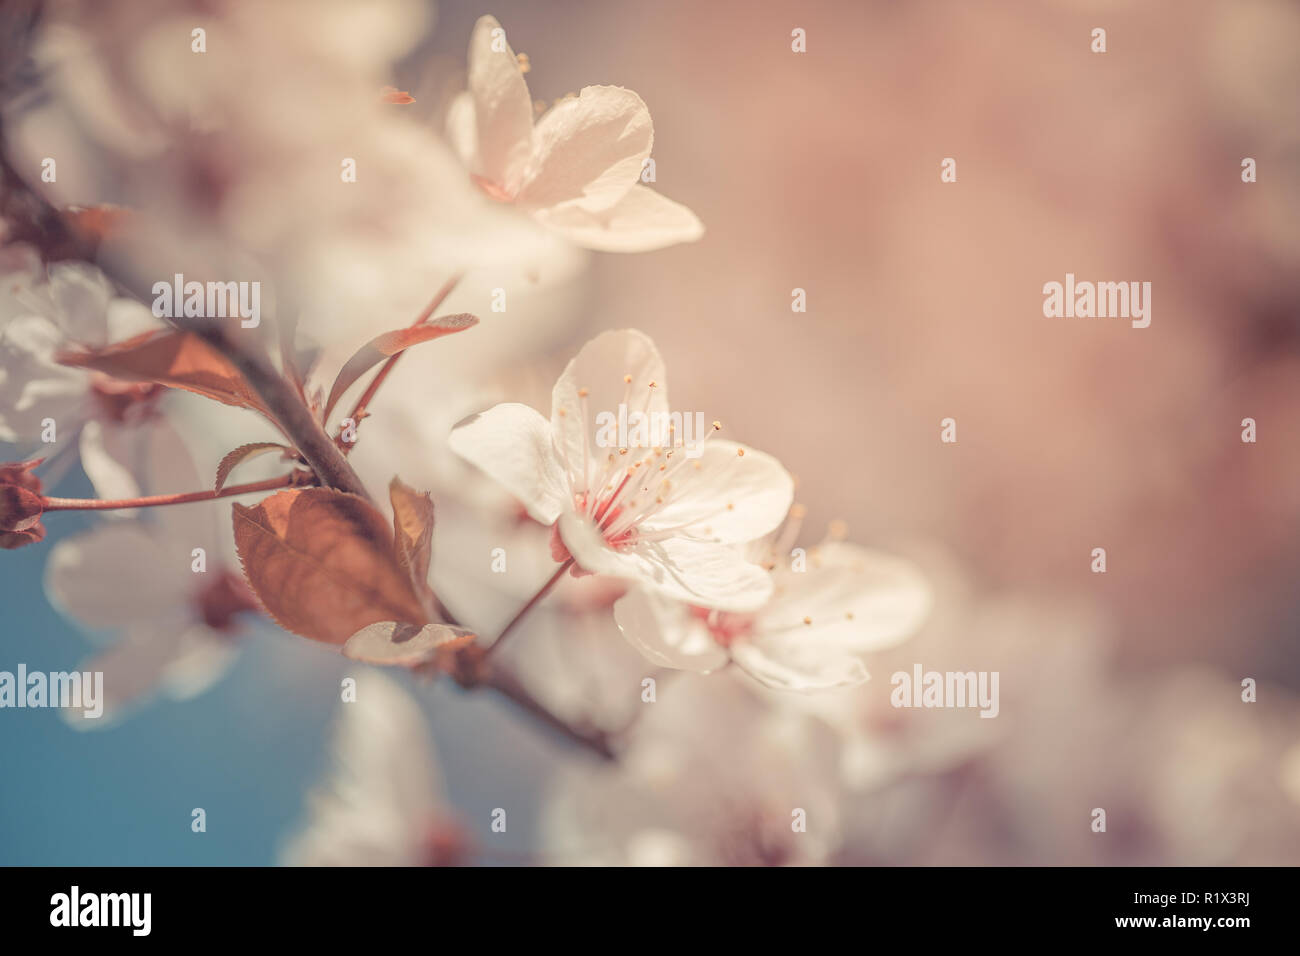 Frühling Kirschblüten blühen, rosa Blüten, Sakura Japanische Blumen Jahreszeit, mit leere Kopie Raum Stockfoto